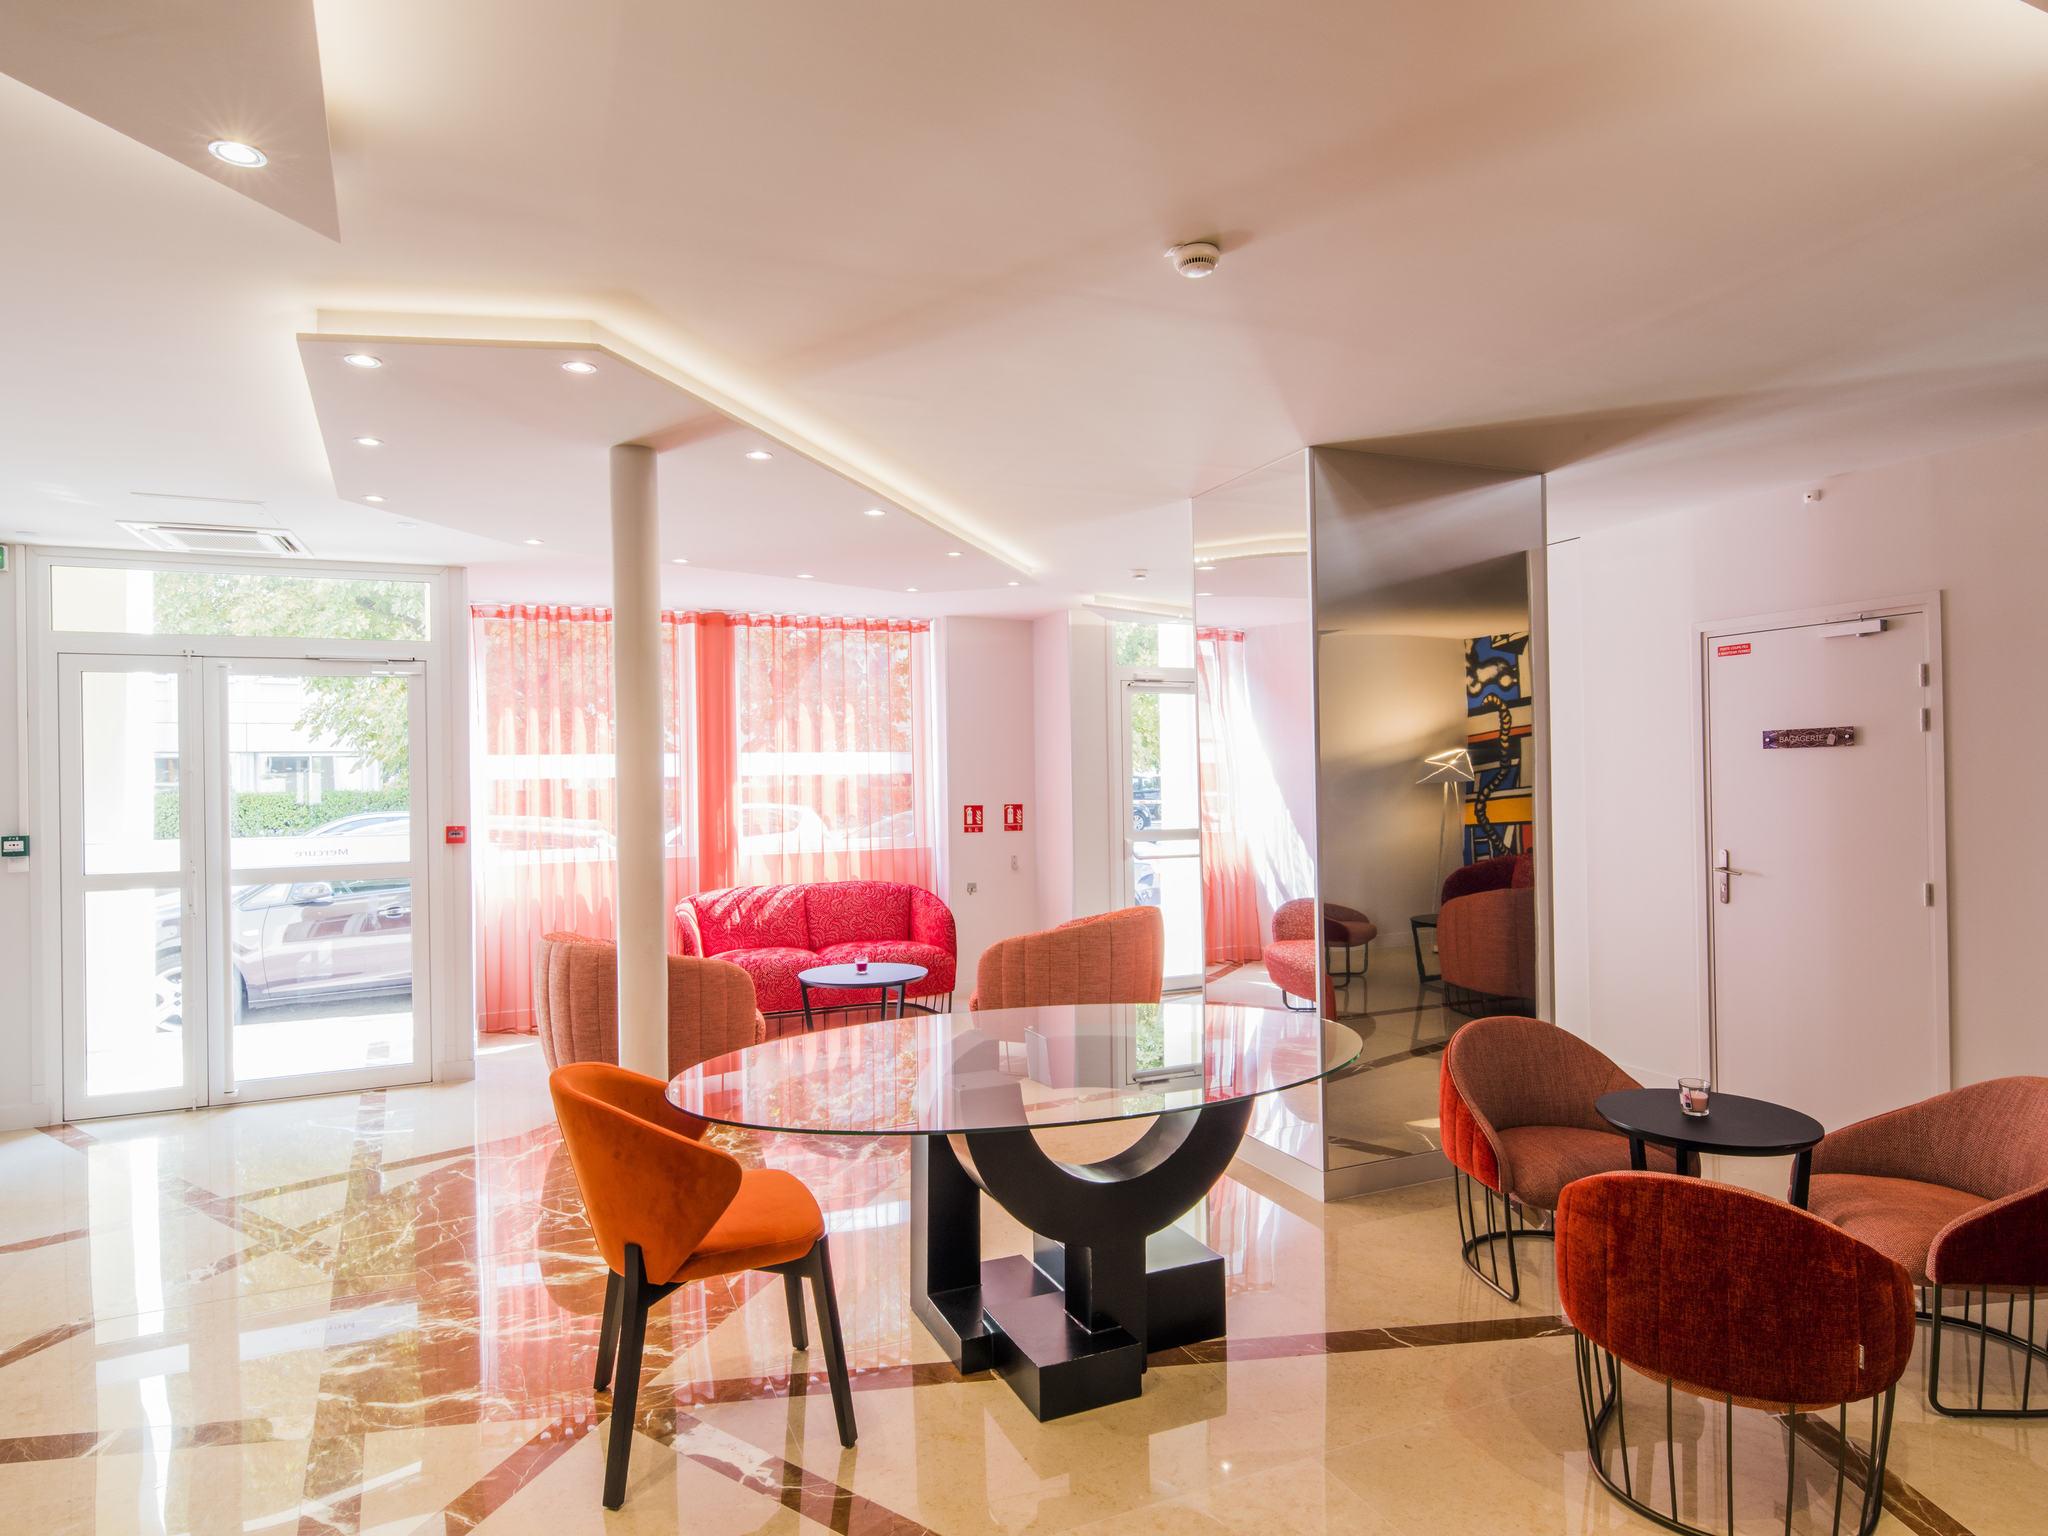 Hotel - Mercure Paris Pont de Levallois Neuilly (Eröffnung: Juni 2018)